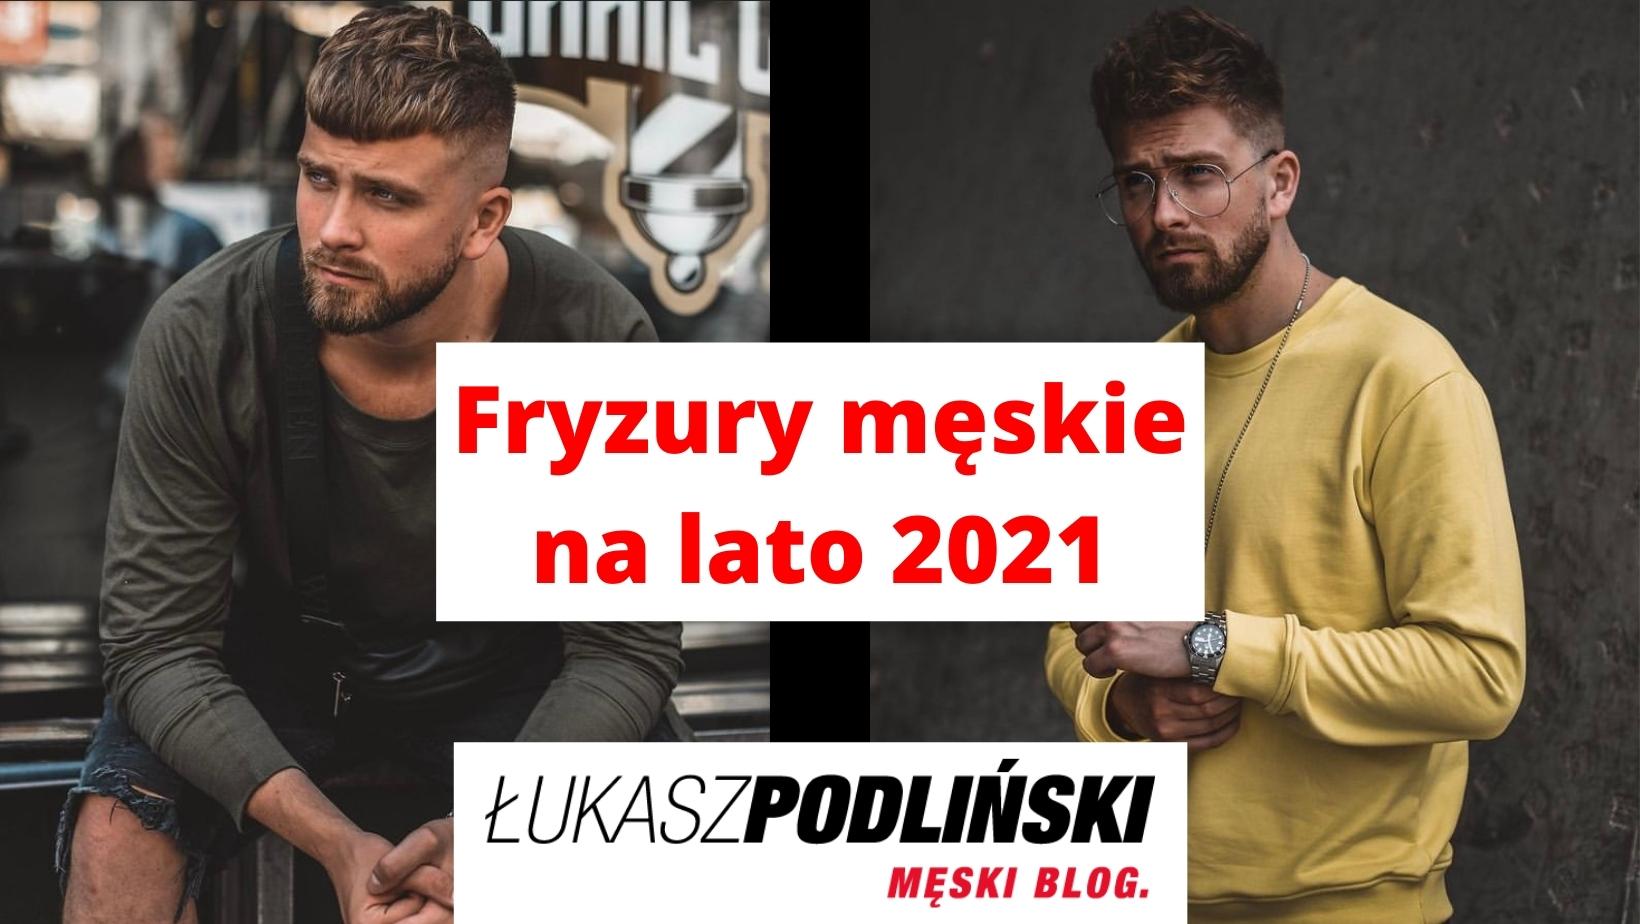 Fryzury męskie na lato 2021